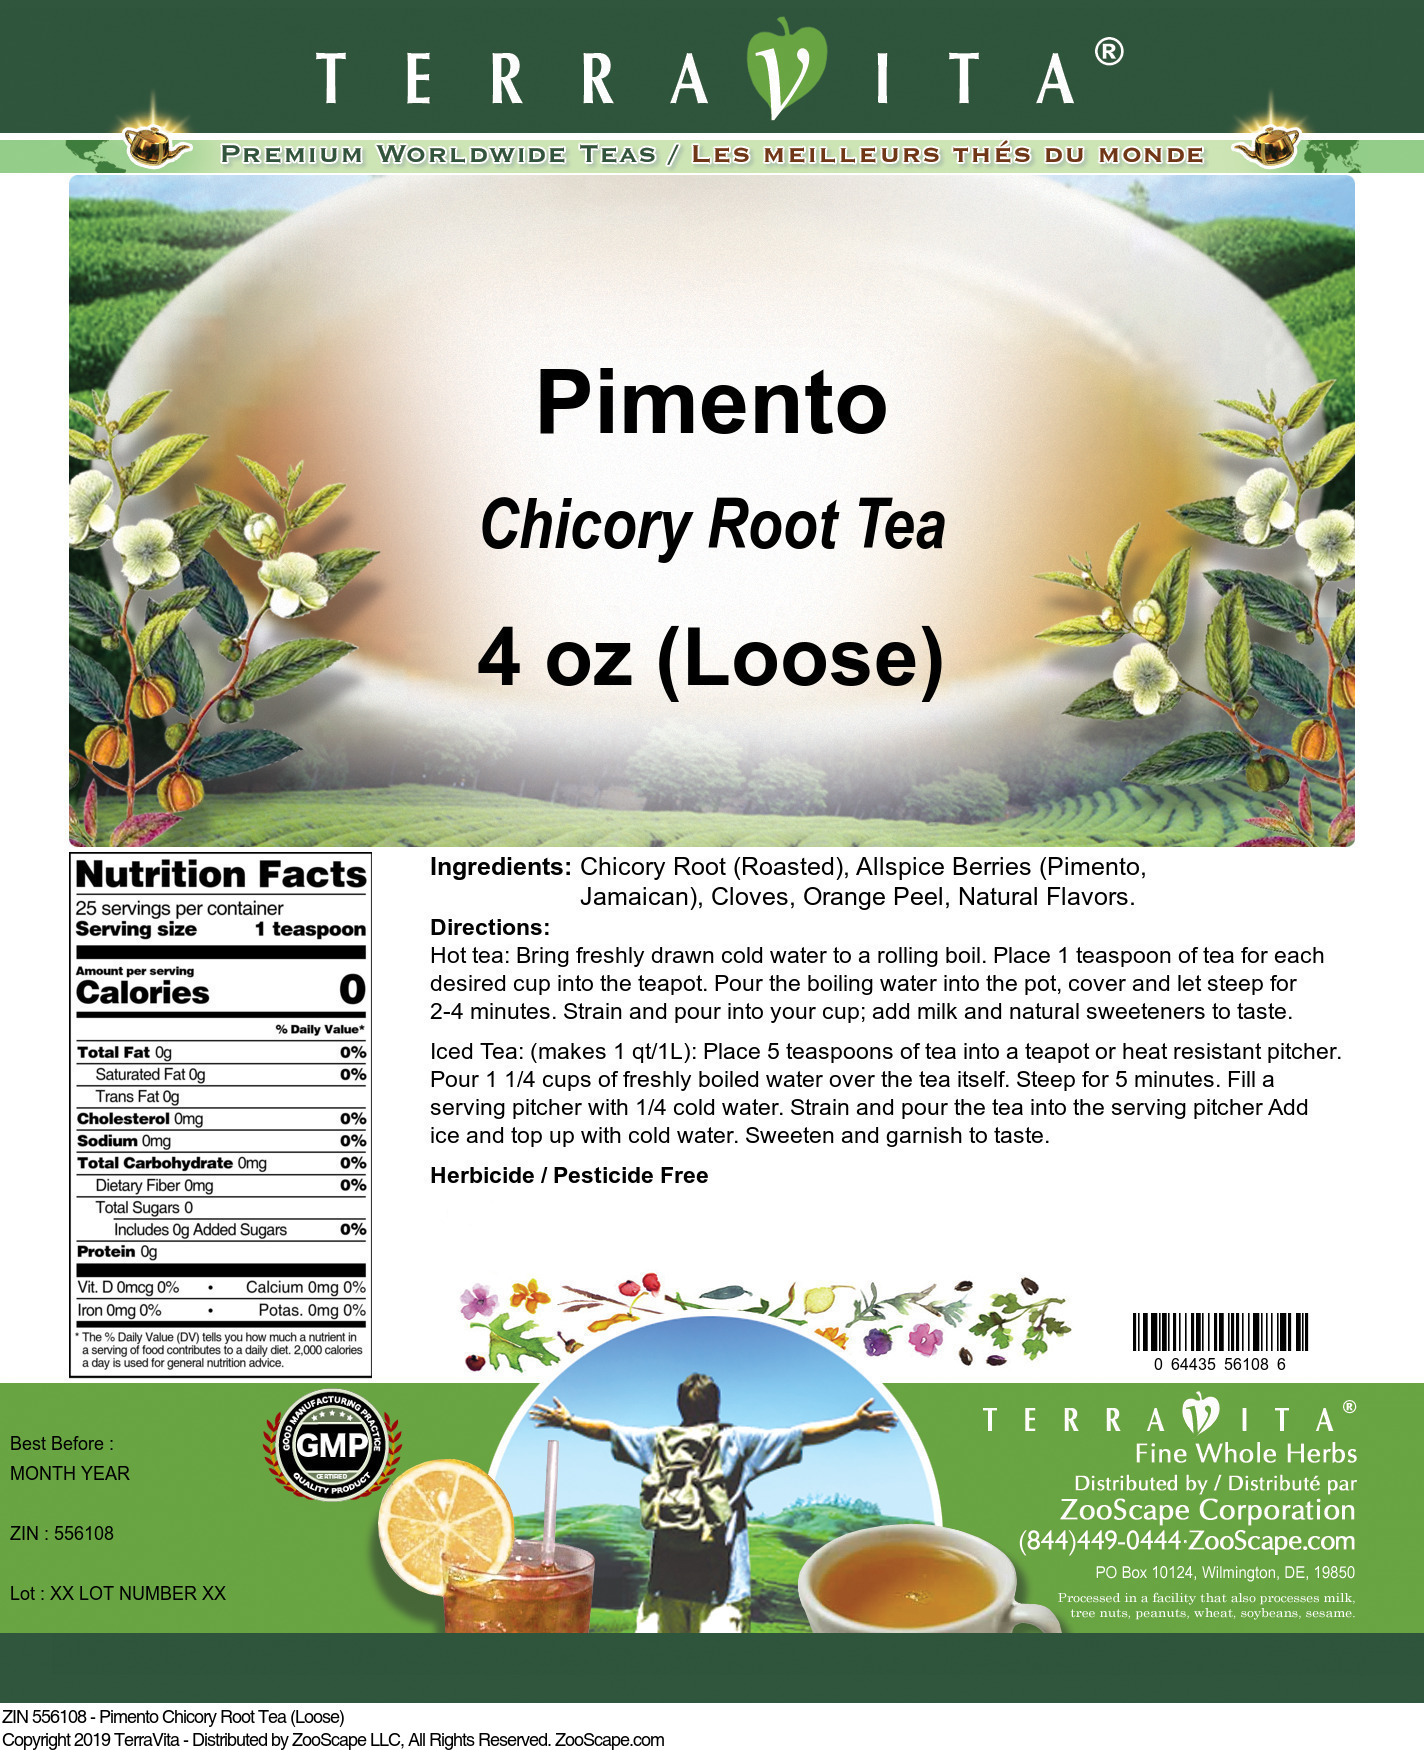 Pimento Chicory Root Tea (Loose)